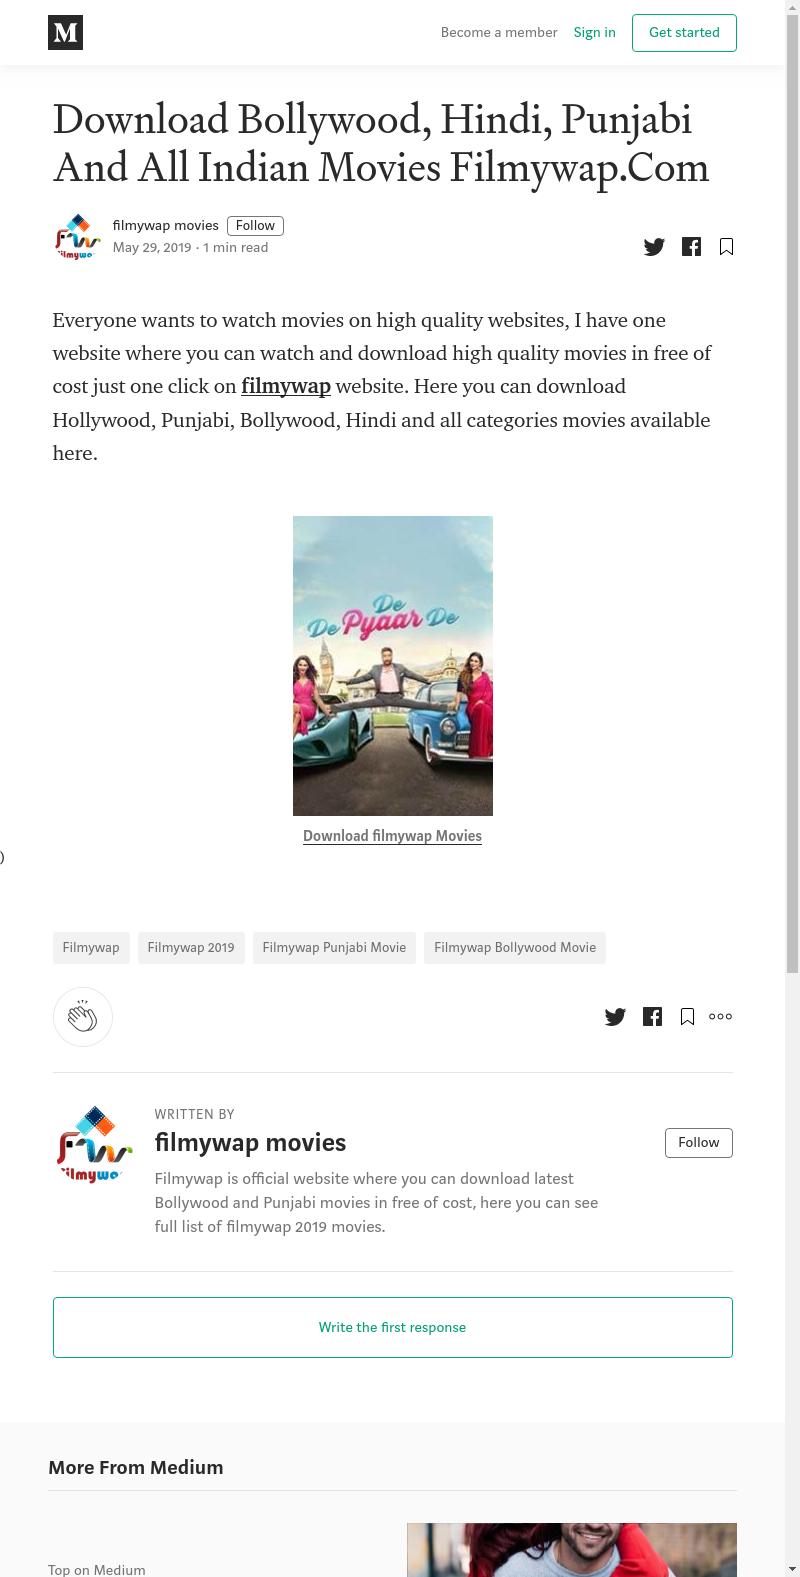 filmywap · Posts